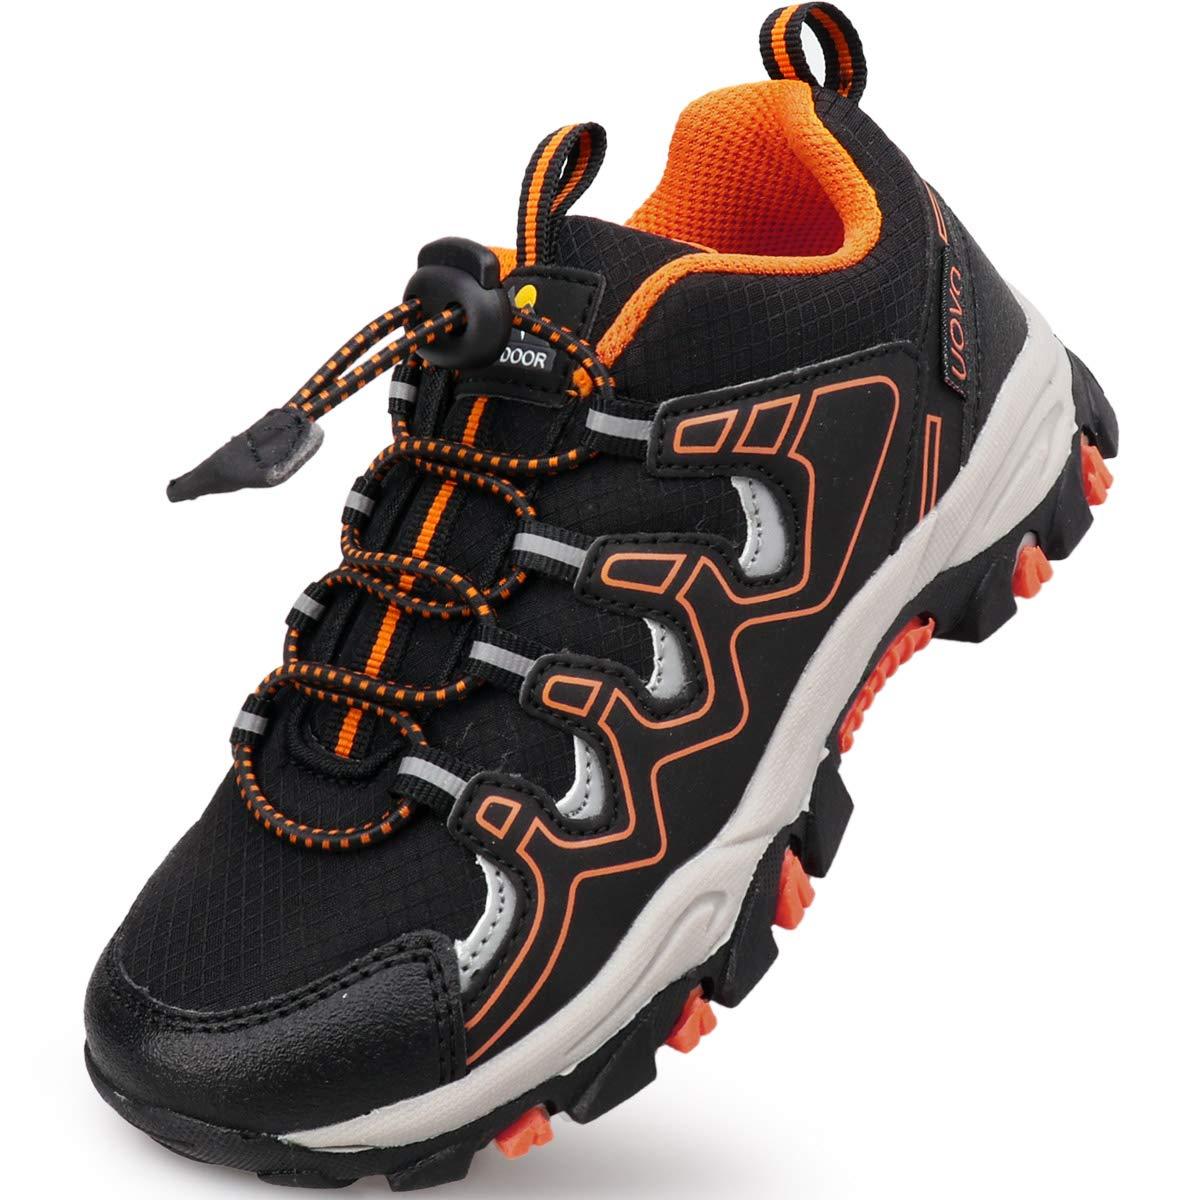 UOVO Boys Shoes Boys Running Sneakers Tennis Hiking Shoes Kids Athletic Outdoor Sneakers Slip Resistant(Little Boys/Big Boys) (5 M US Big Kid, Black/Orange)